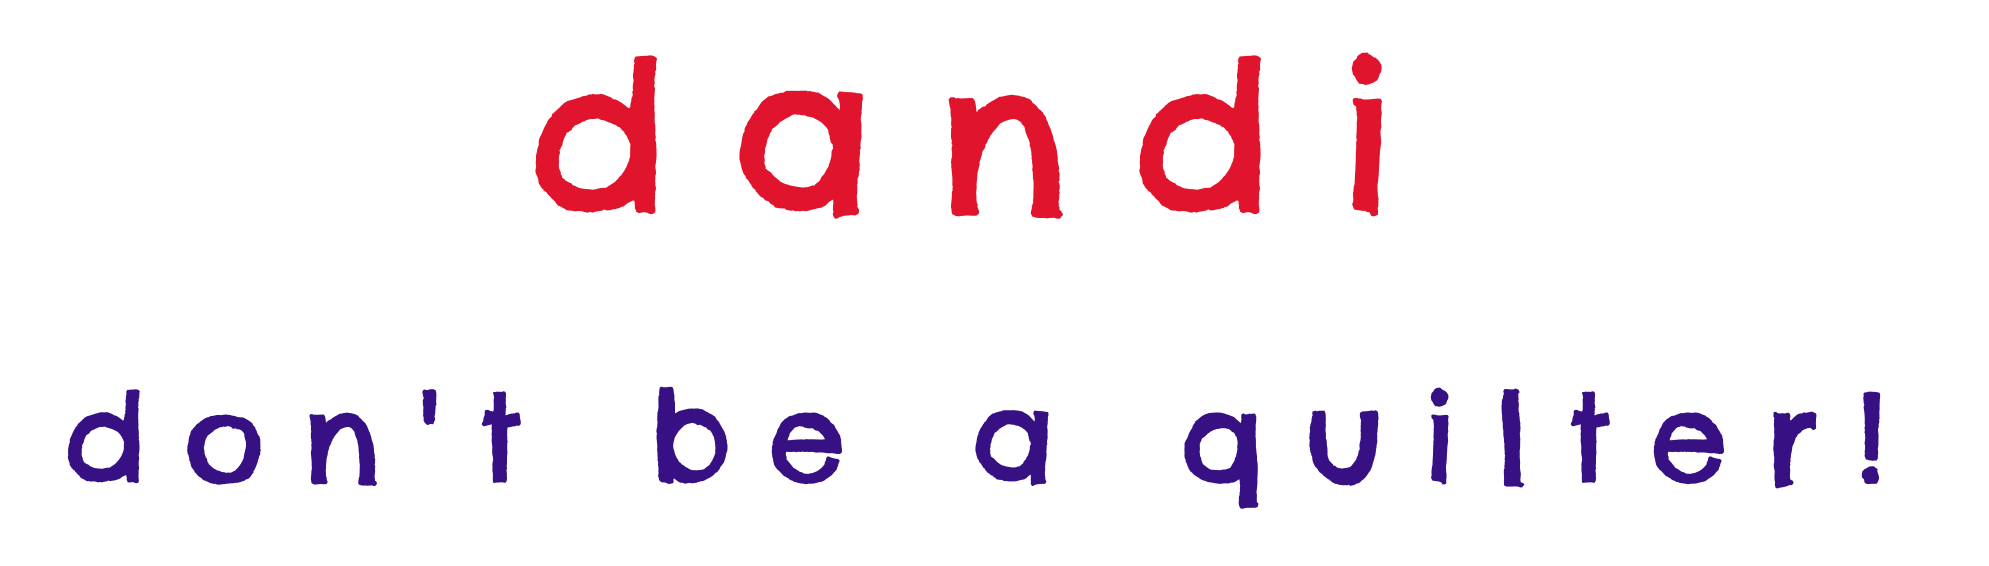 dandi-title.png